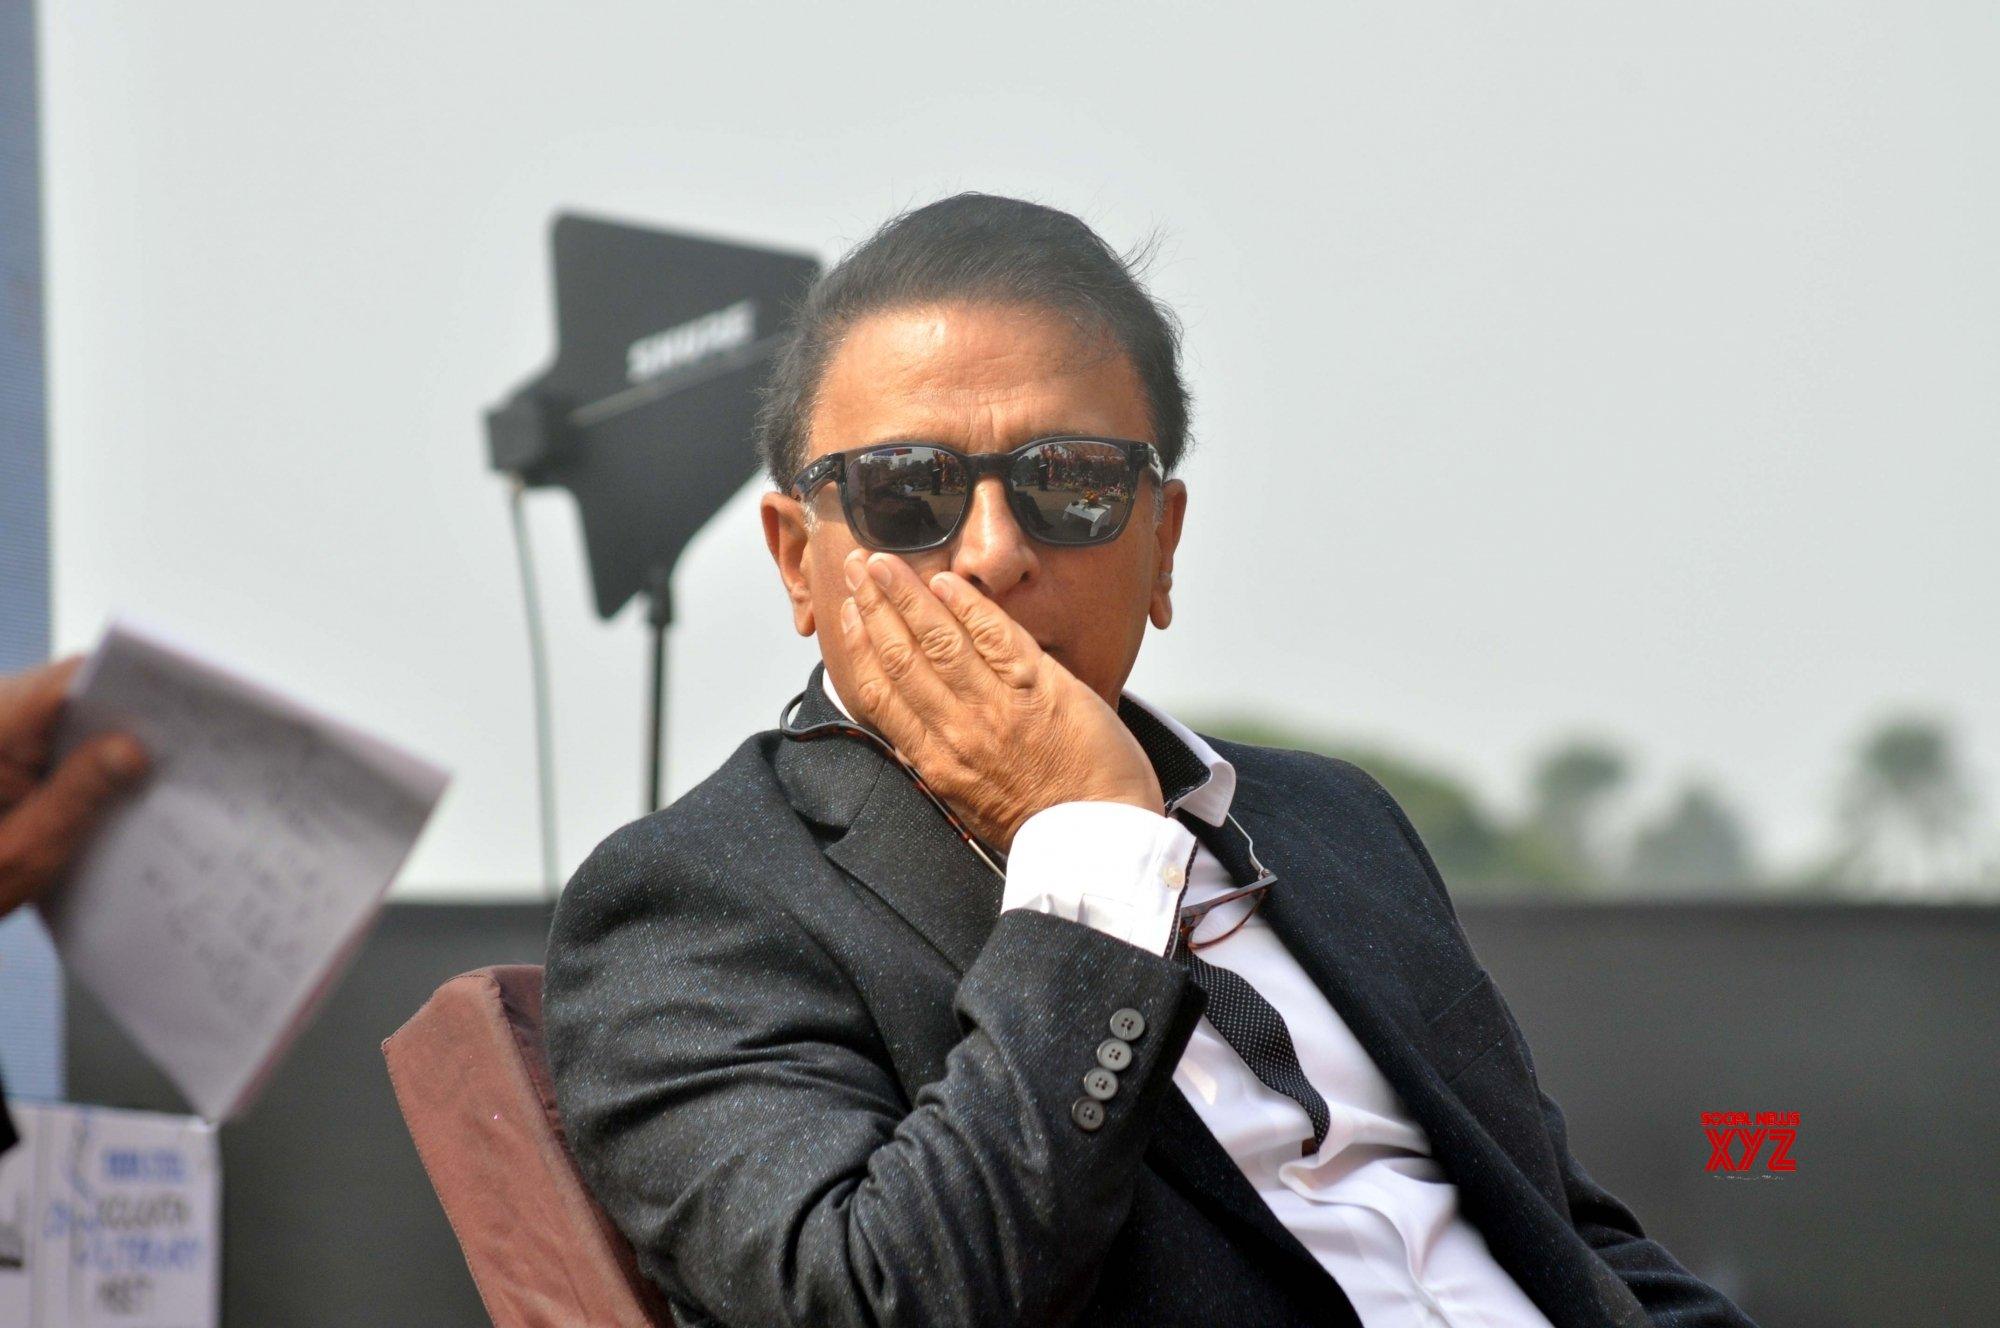 Hope IPL 13 will infuse positivity among millions, says Gavaskar